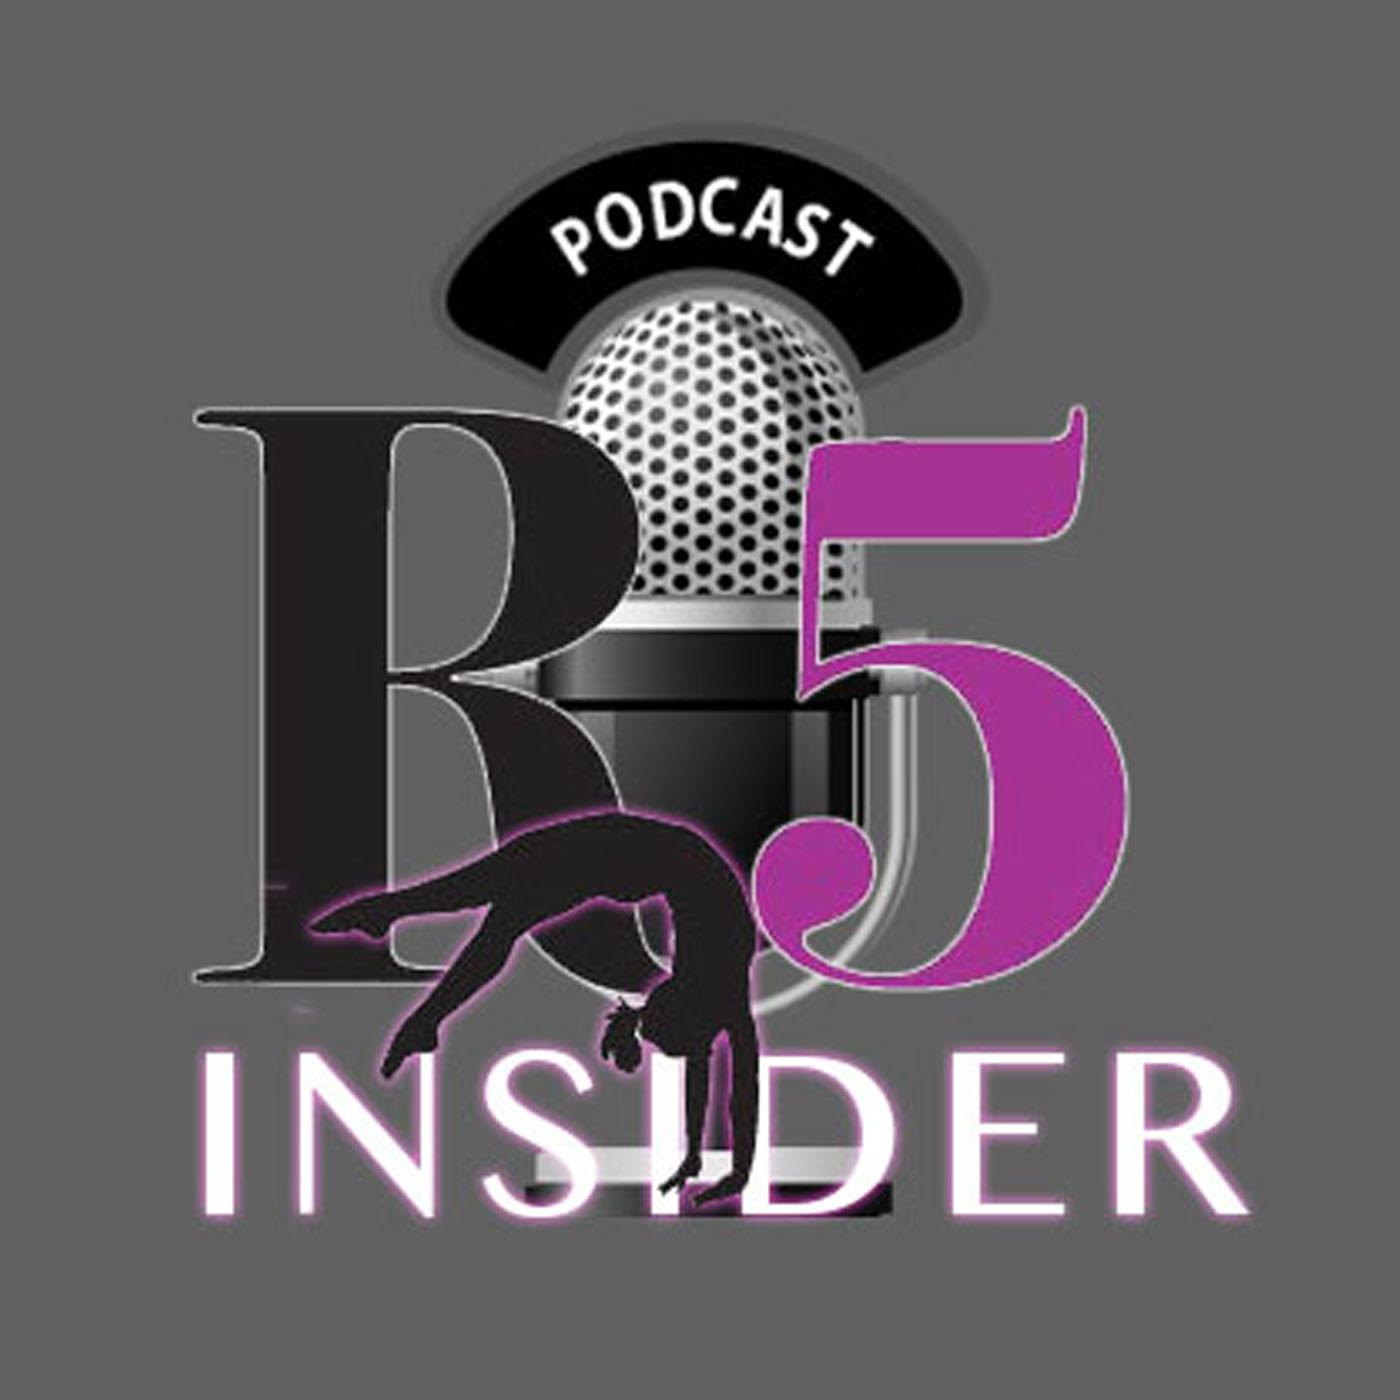 5ae96c6ab083 Region 5 Insider Podcast Episode #1 - Region 5 Gymnastics Insider Podcast |  Listen Notes